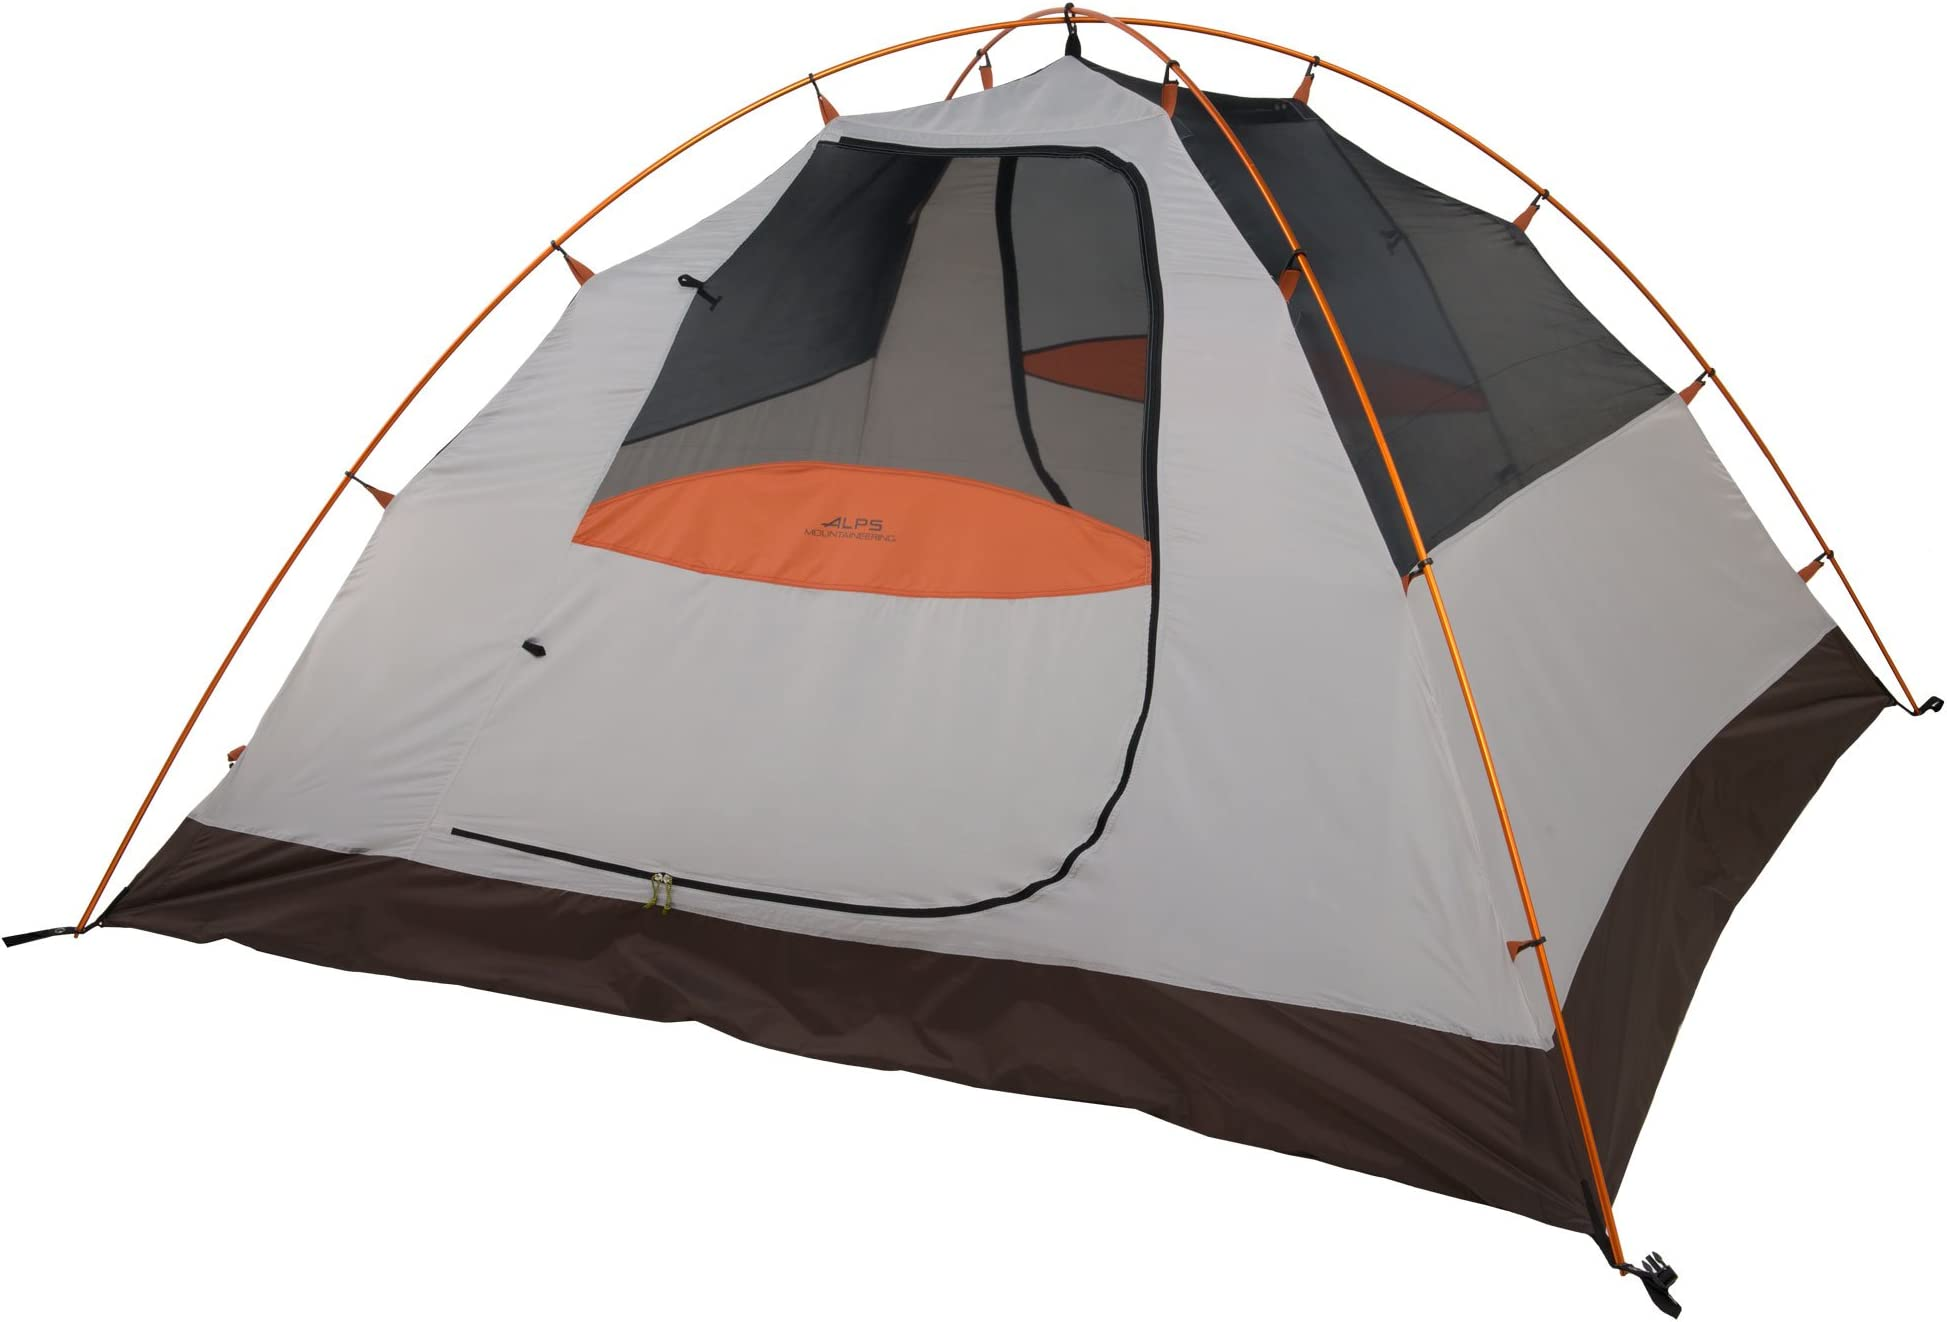 ALPS Mountaineering Lynx 4 Person Tent  sc 1 st  Amazon.com & Camping Tents | Amazon.com